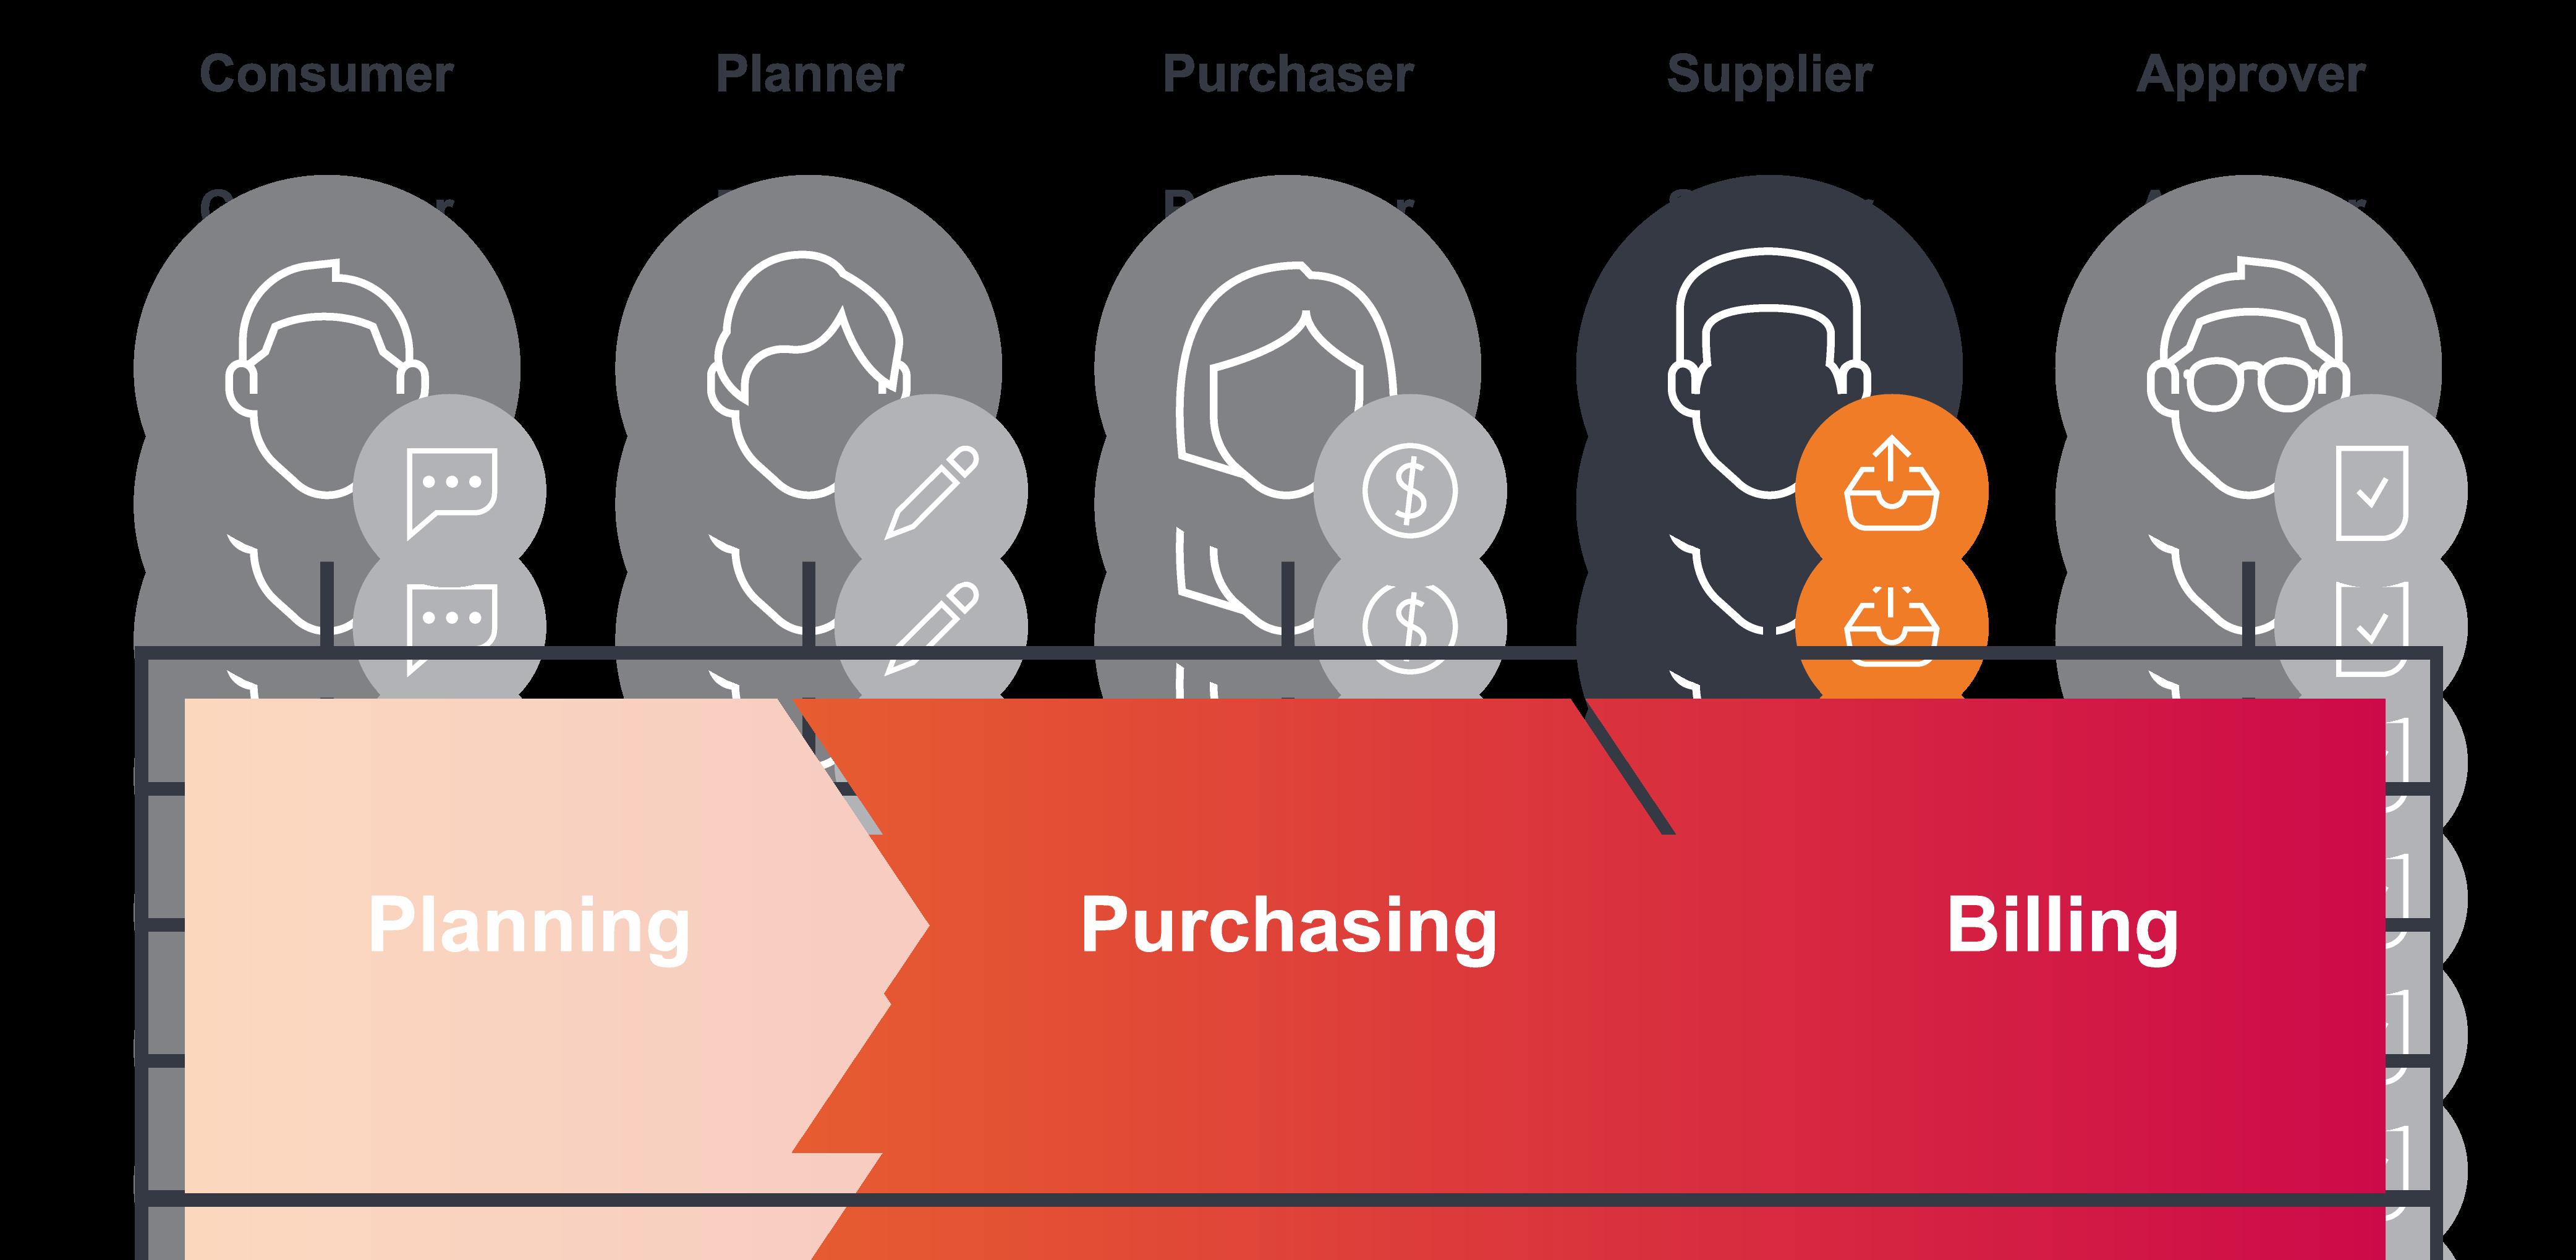 Stakeholder FUTURA - Supplier